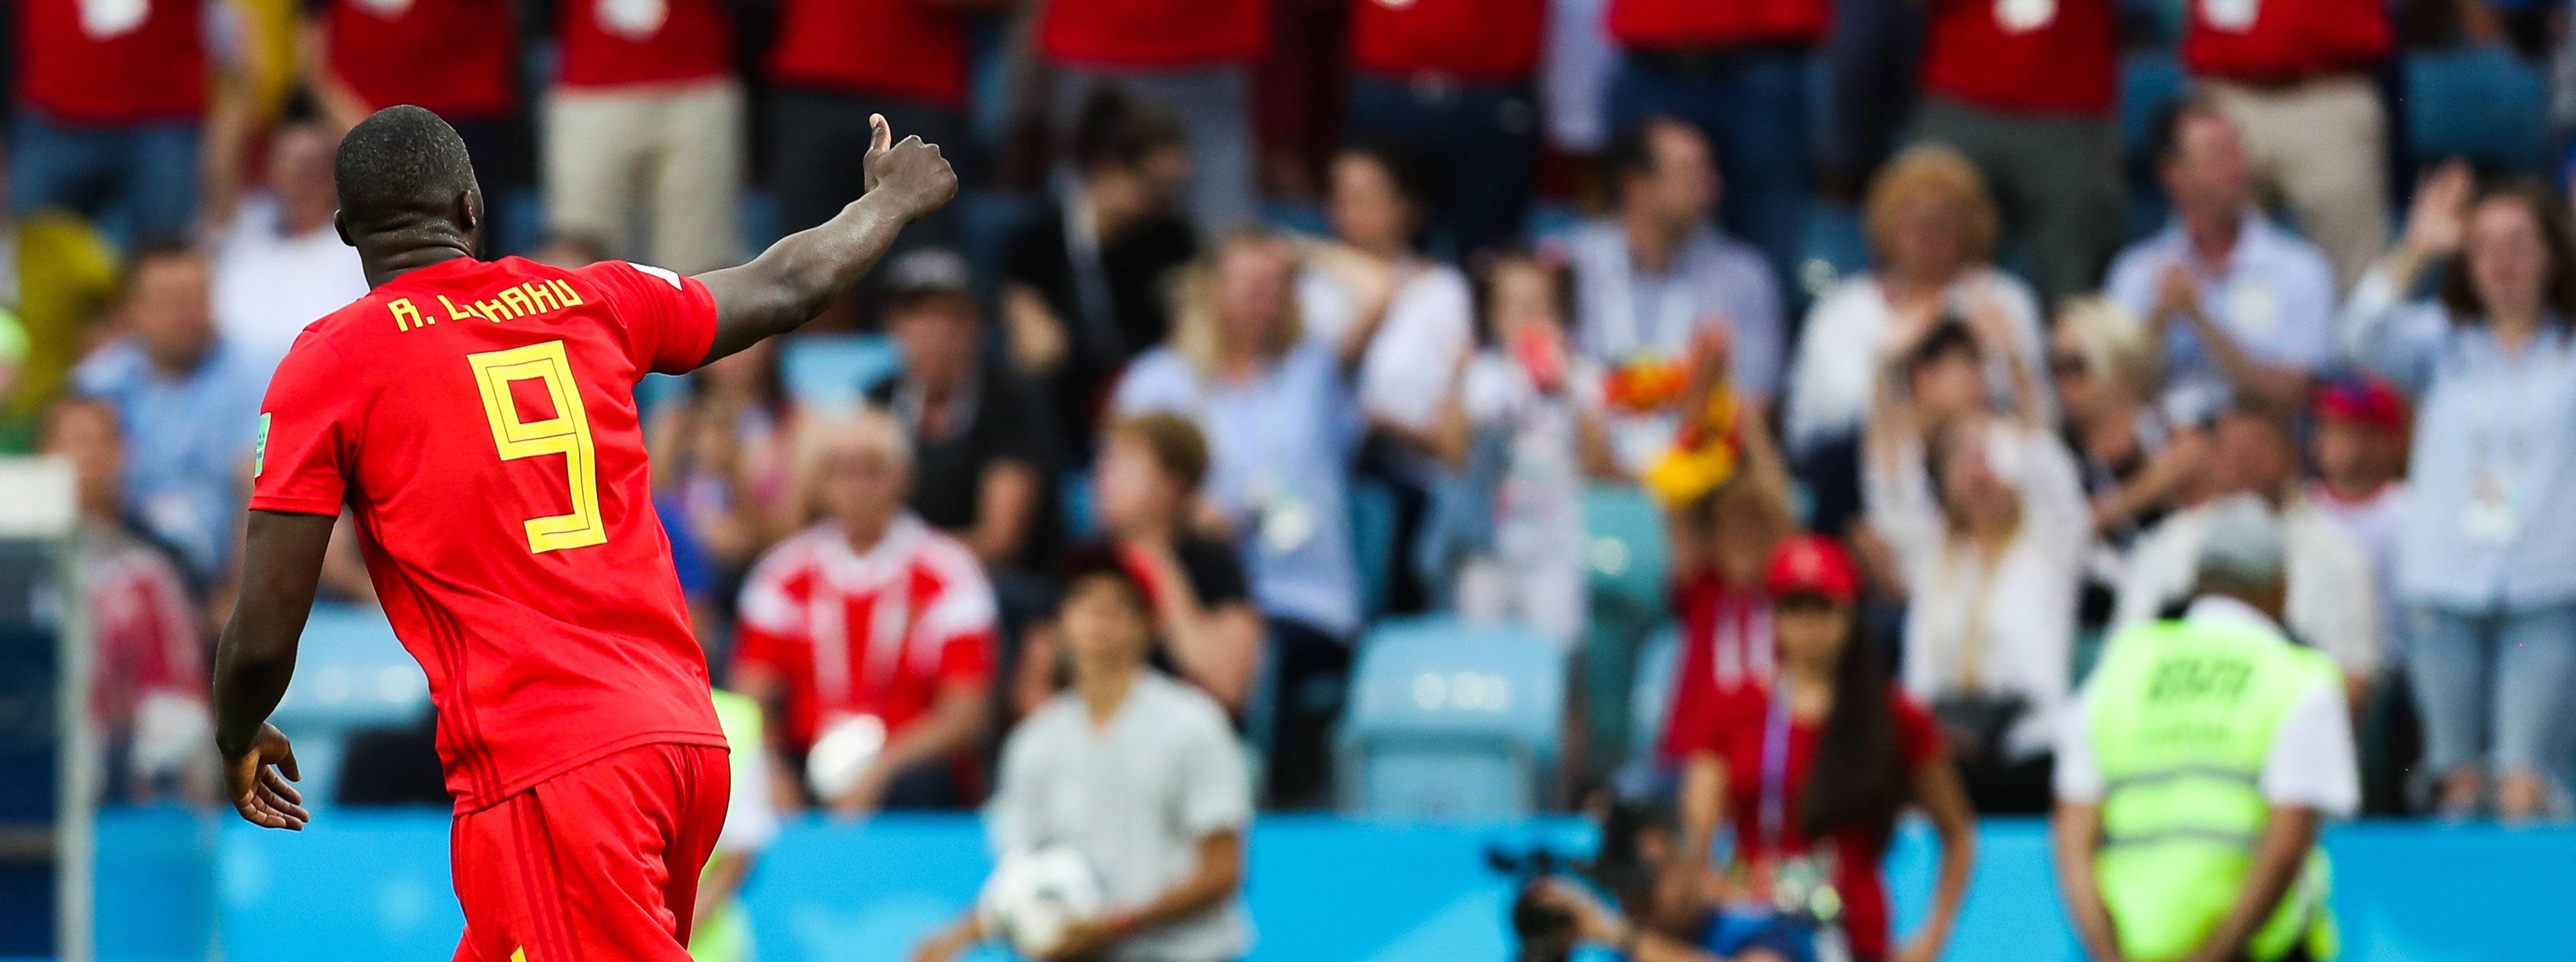 Romelu Lukaku - Belgium - Red Devils